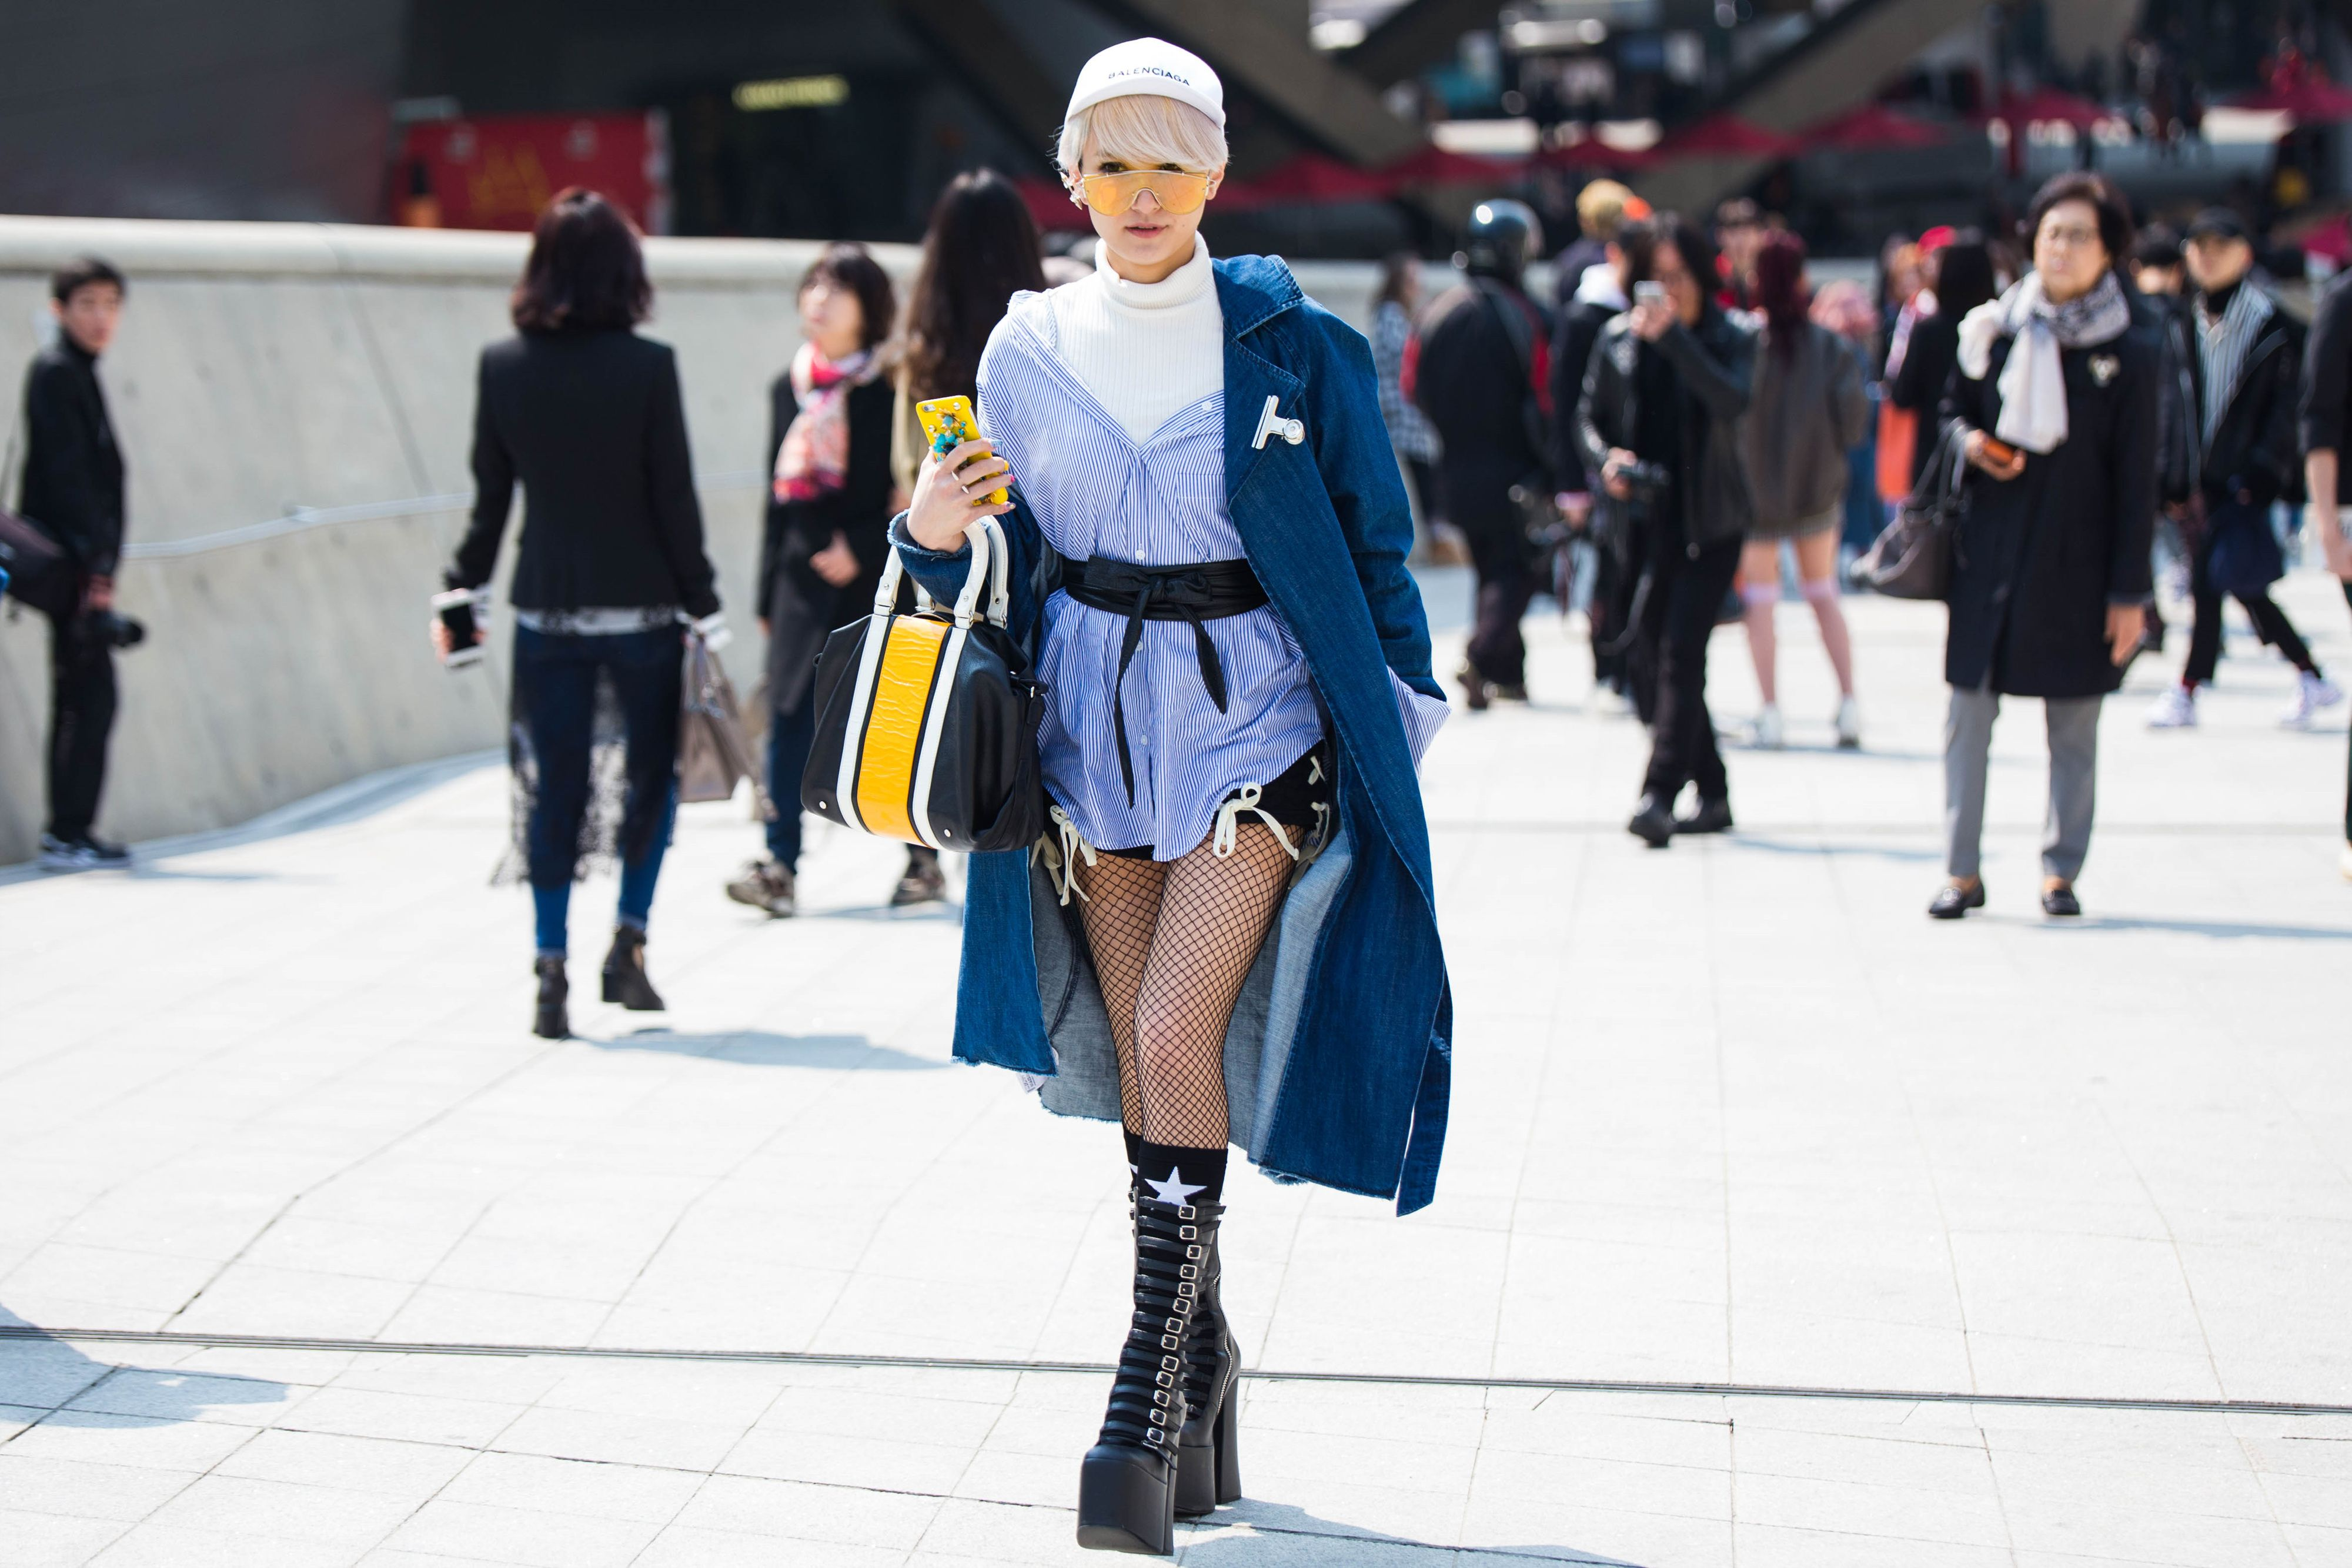 Image Result For Seoul Fashion Week 2017 Street Style Style Inspiration Pinterest Seoul